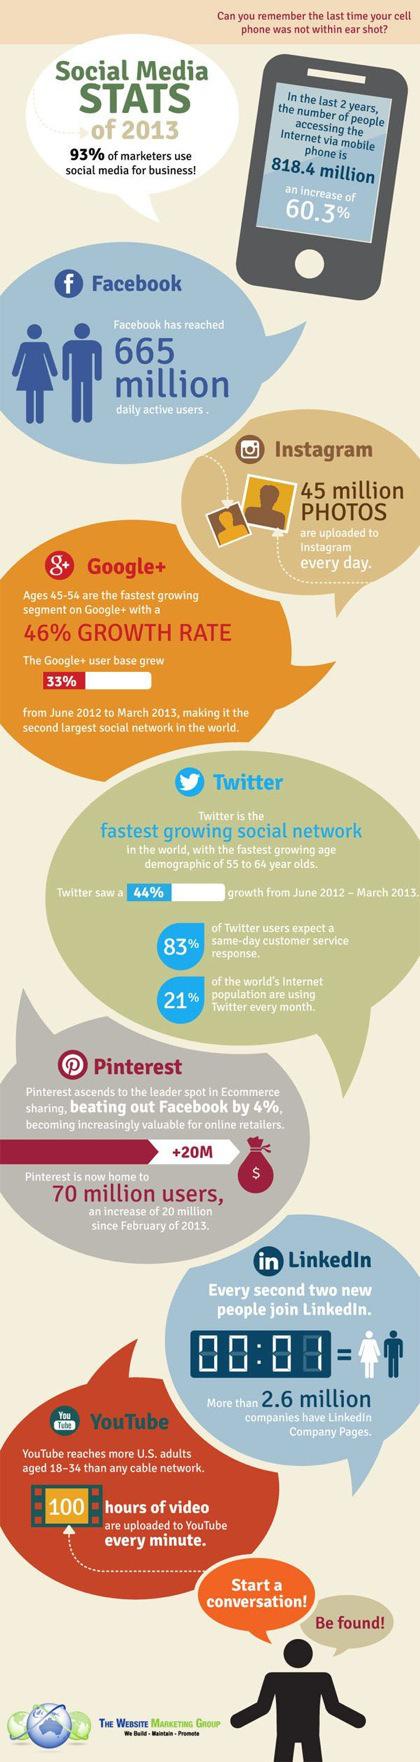 infografia_estadisticas_redes_sociales_2013